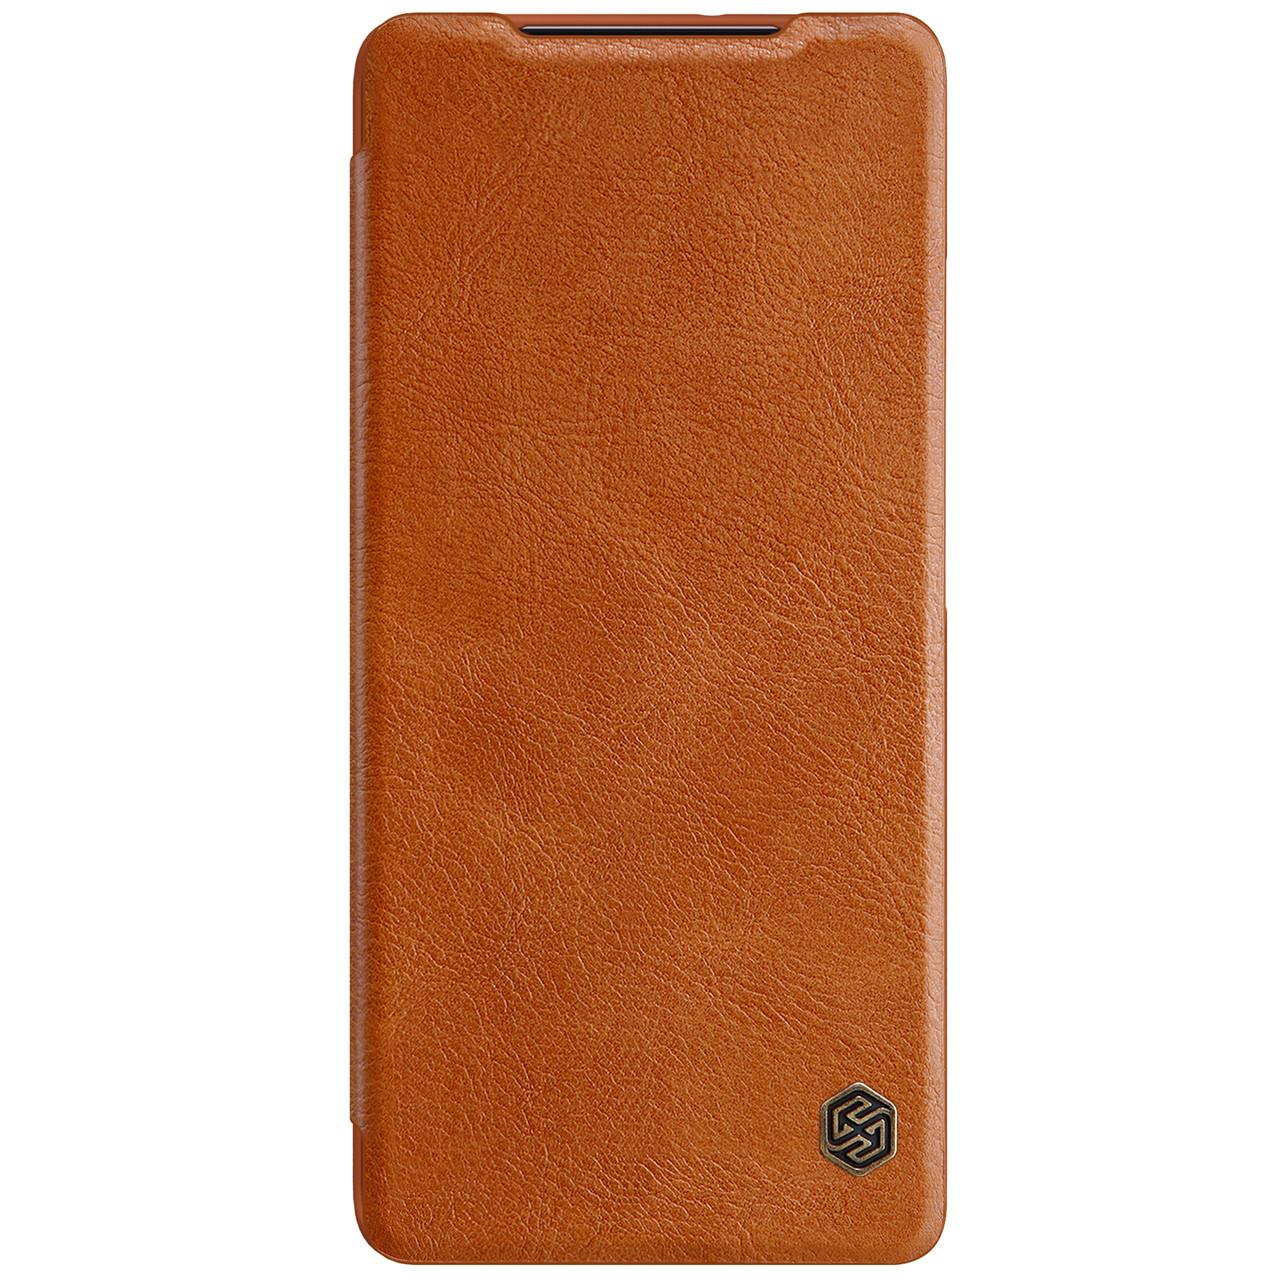 Захисний чохол-книжка Nillkin для Samsung Galaxy S21 Ultra Qin leather case Brown Коричневий